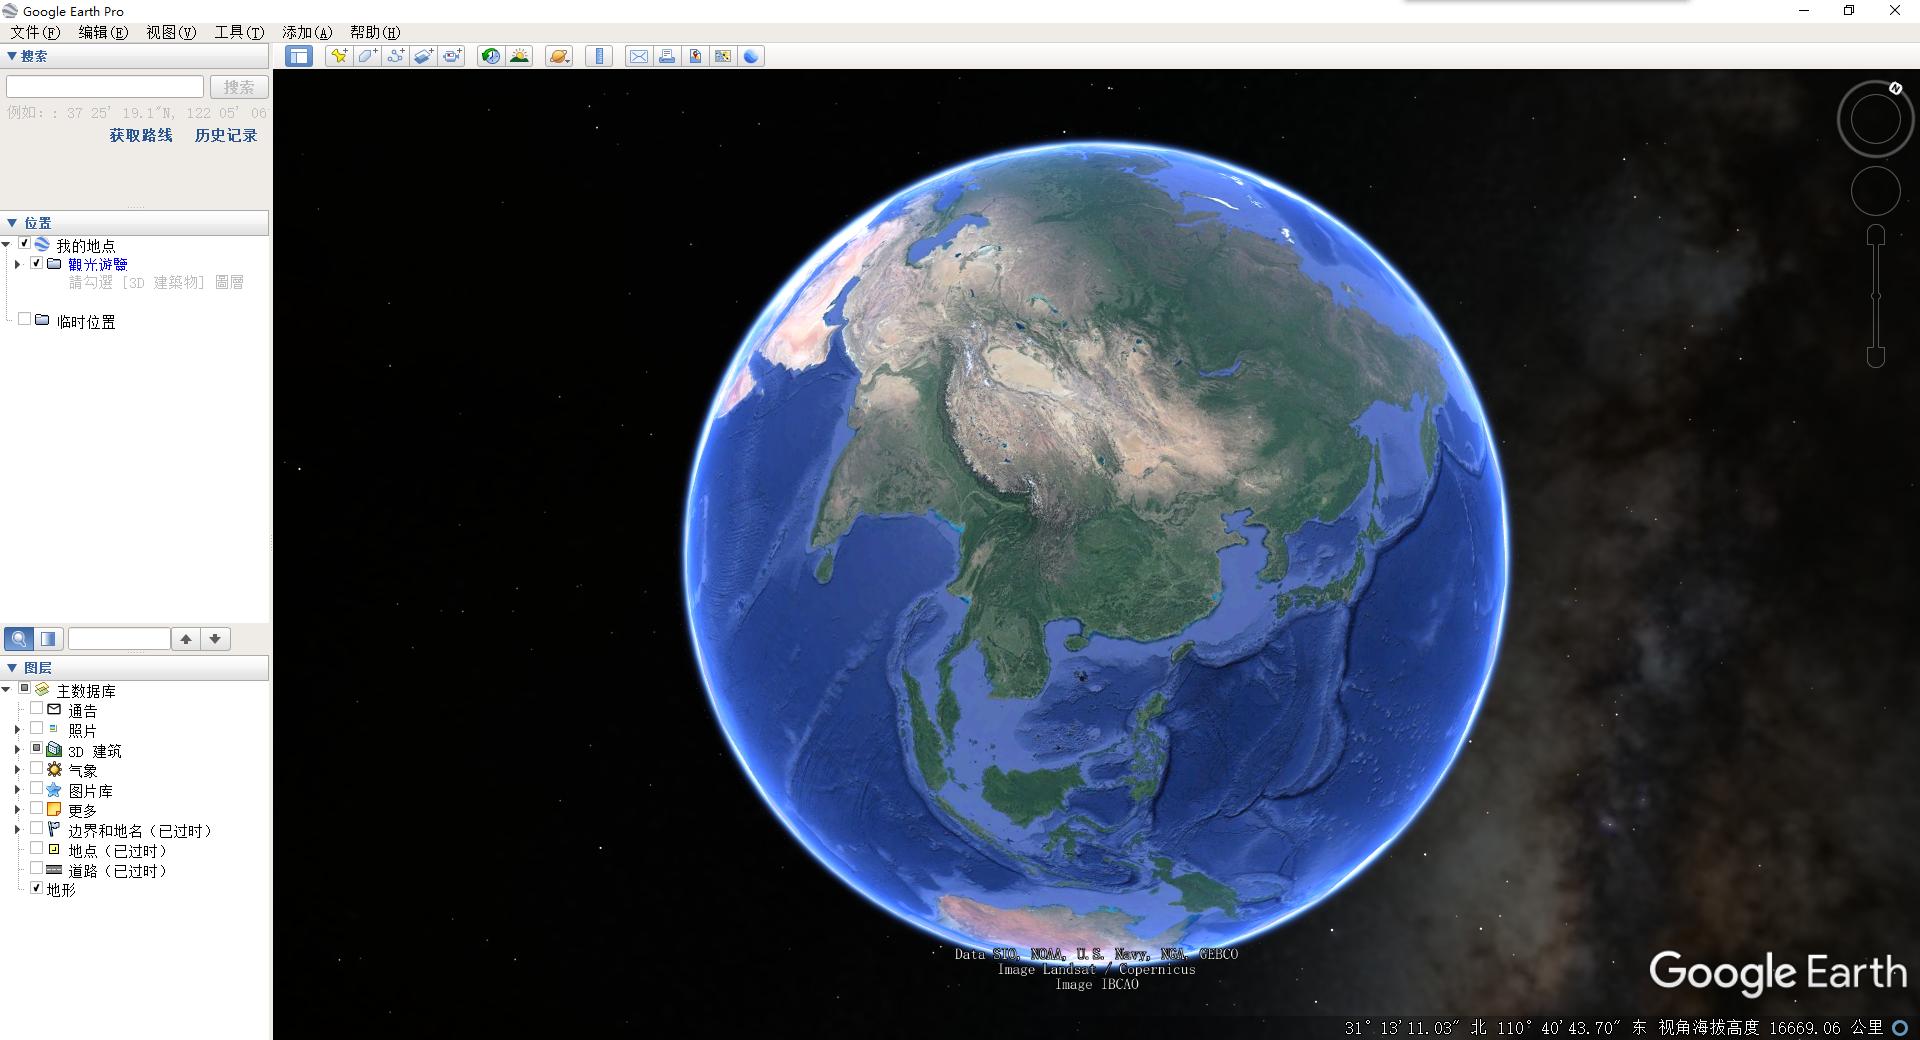 Google Earth Pro v7.3.4.8248 谷歌地球卫星图像软件-免安装-专业版